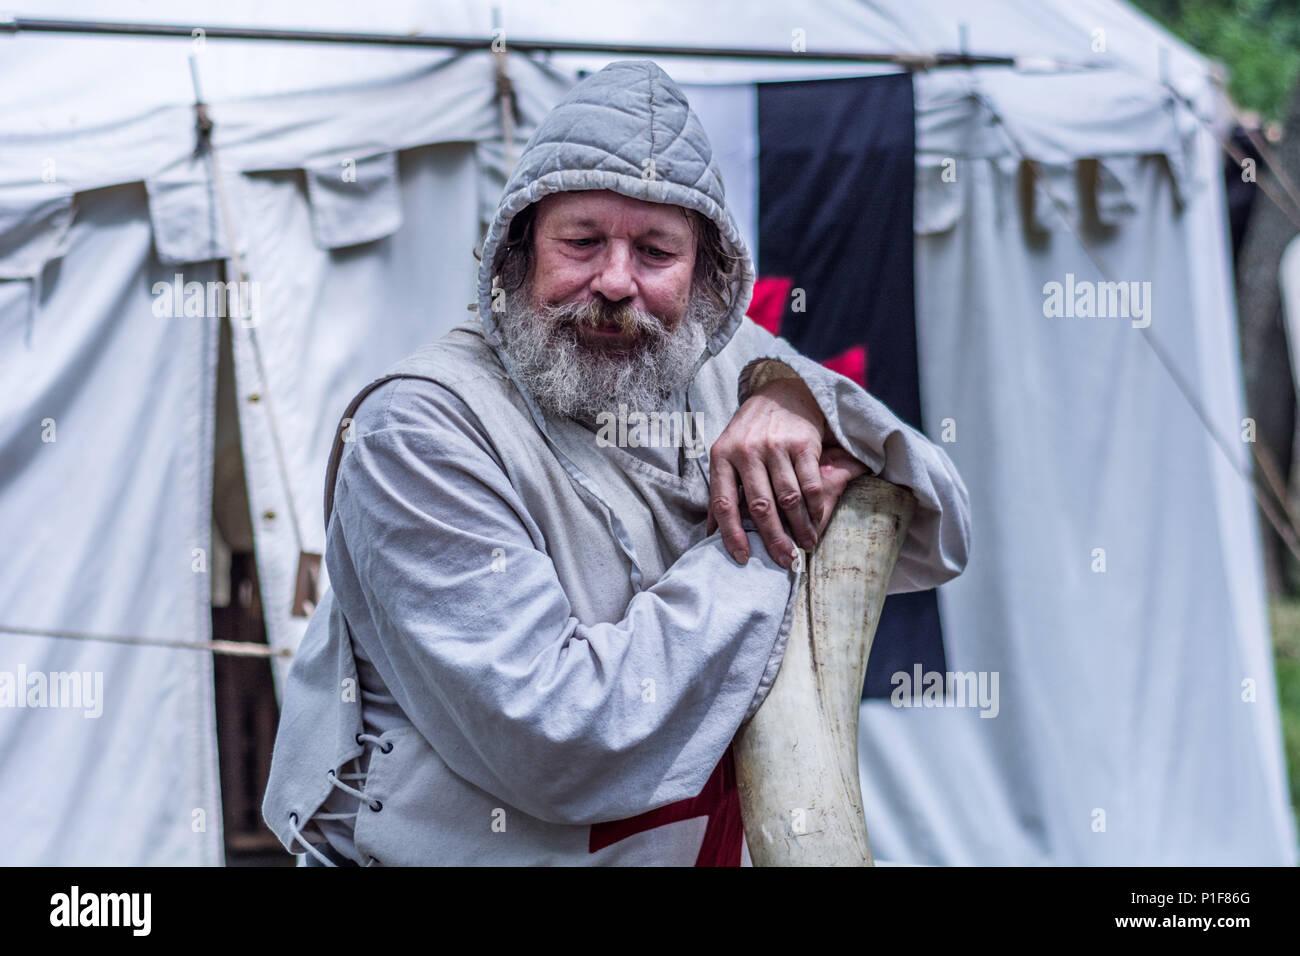 nis-serbia-june-10-2018-portrait-of-old-